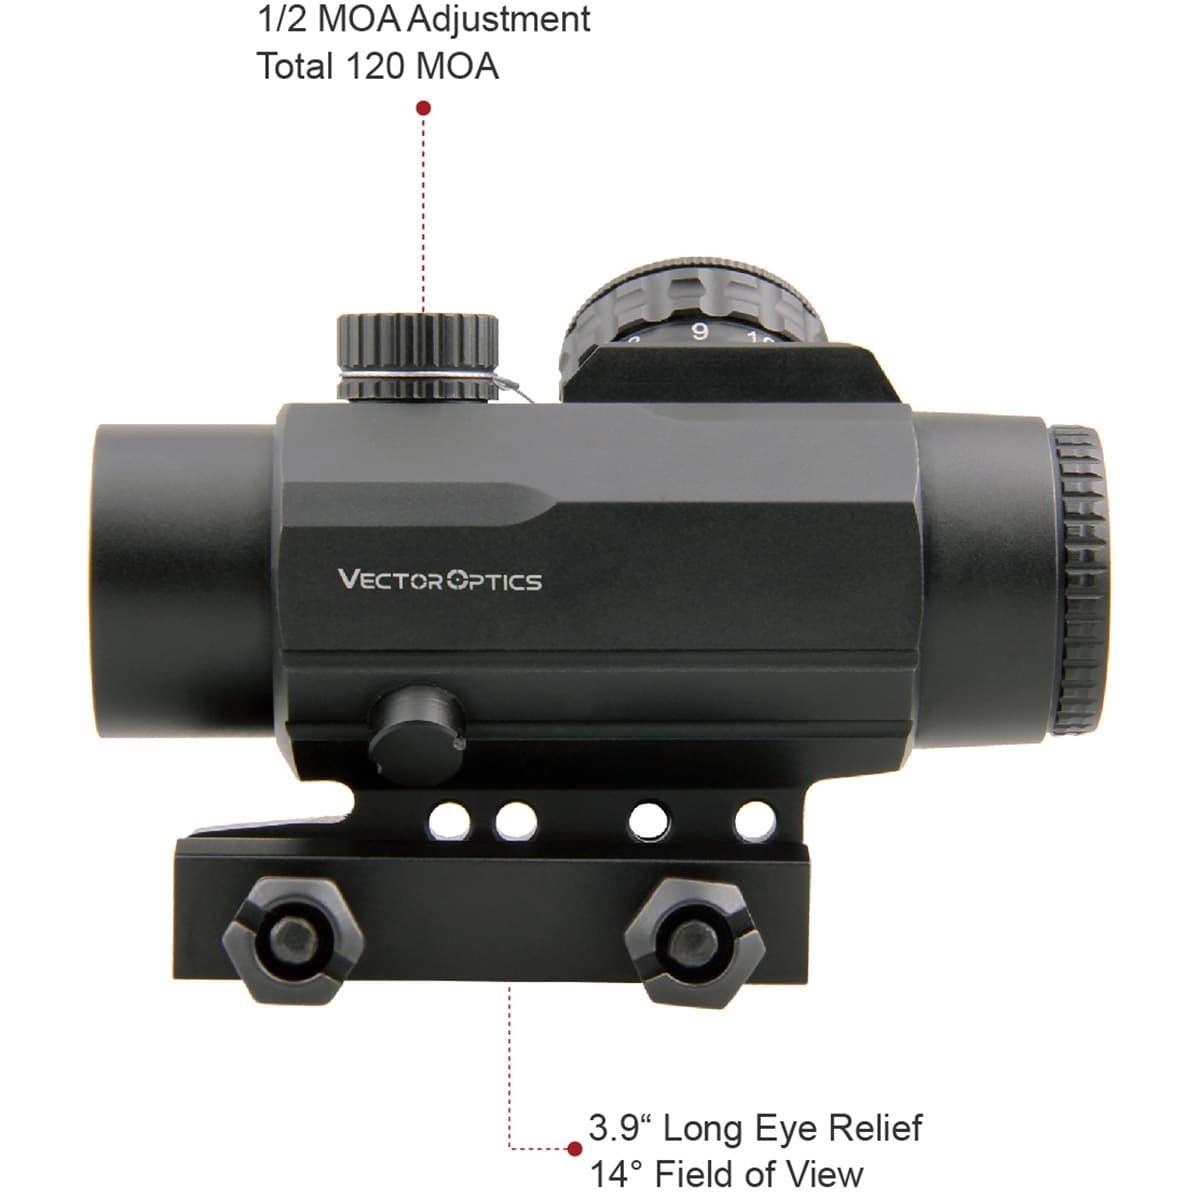 VectorOptics Calypos 1x30 SCOC-25